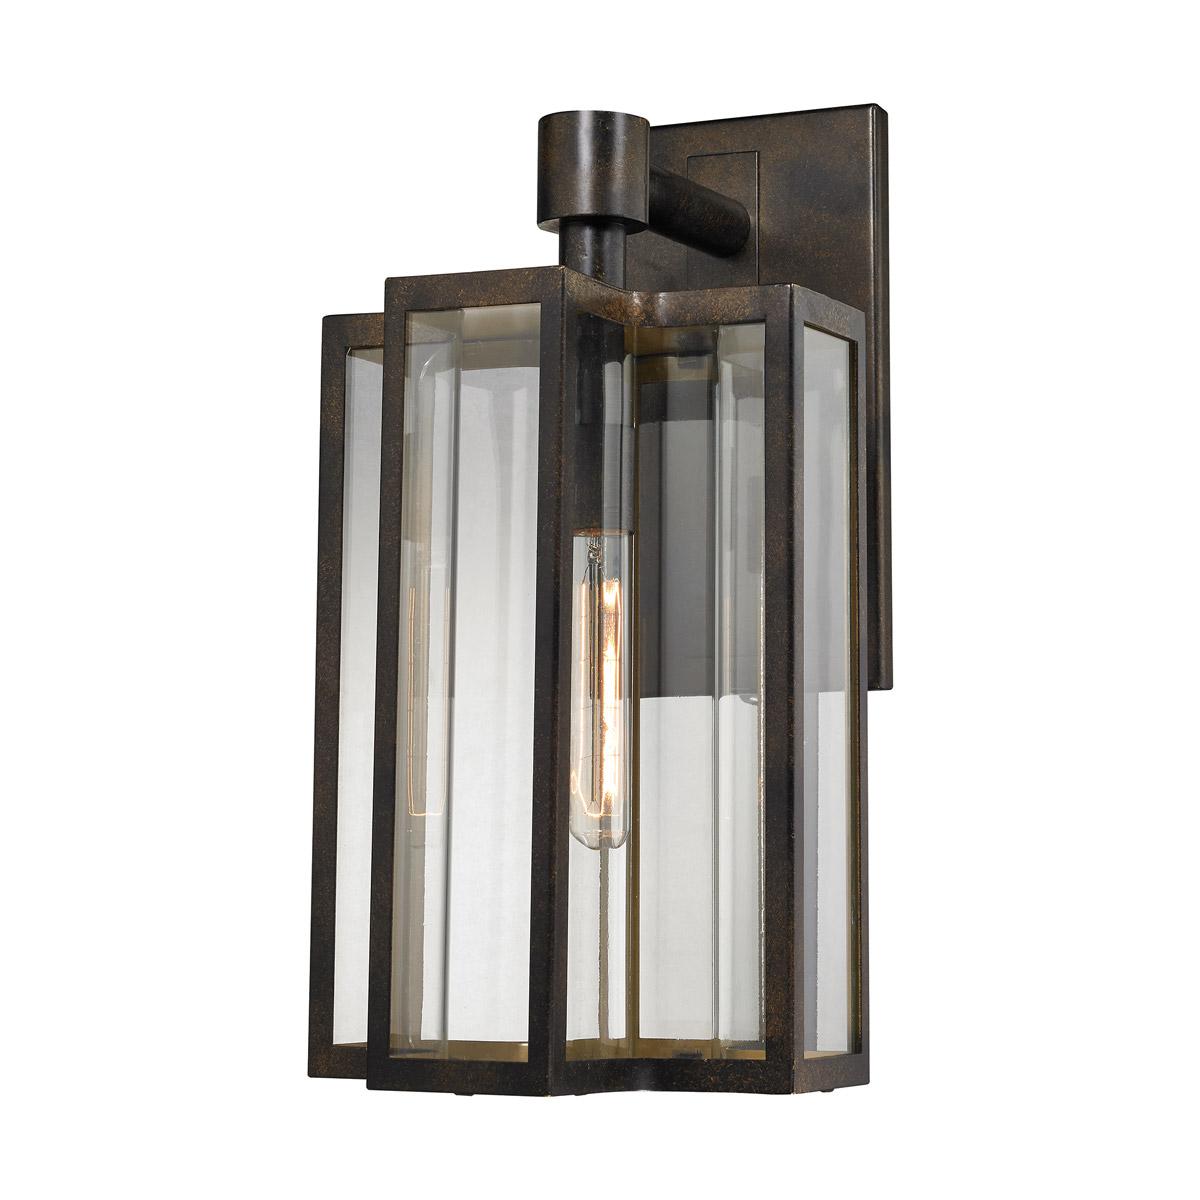 ELK Lighting, Modern Outdoor Lighting, Brooklyn, Accentuations Brand, Furniture by ABD